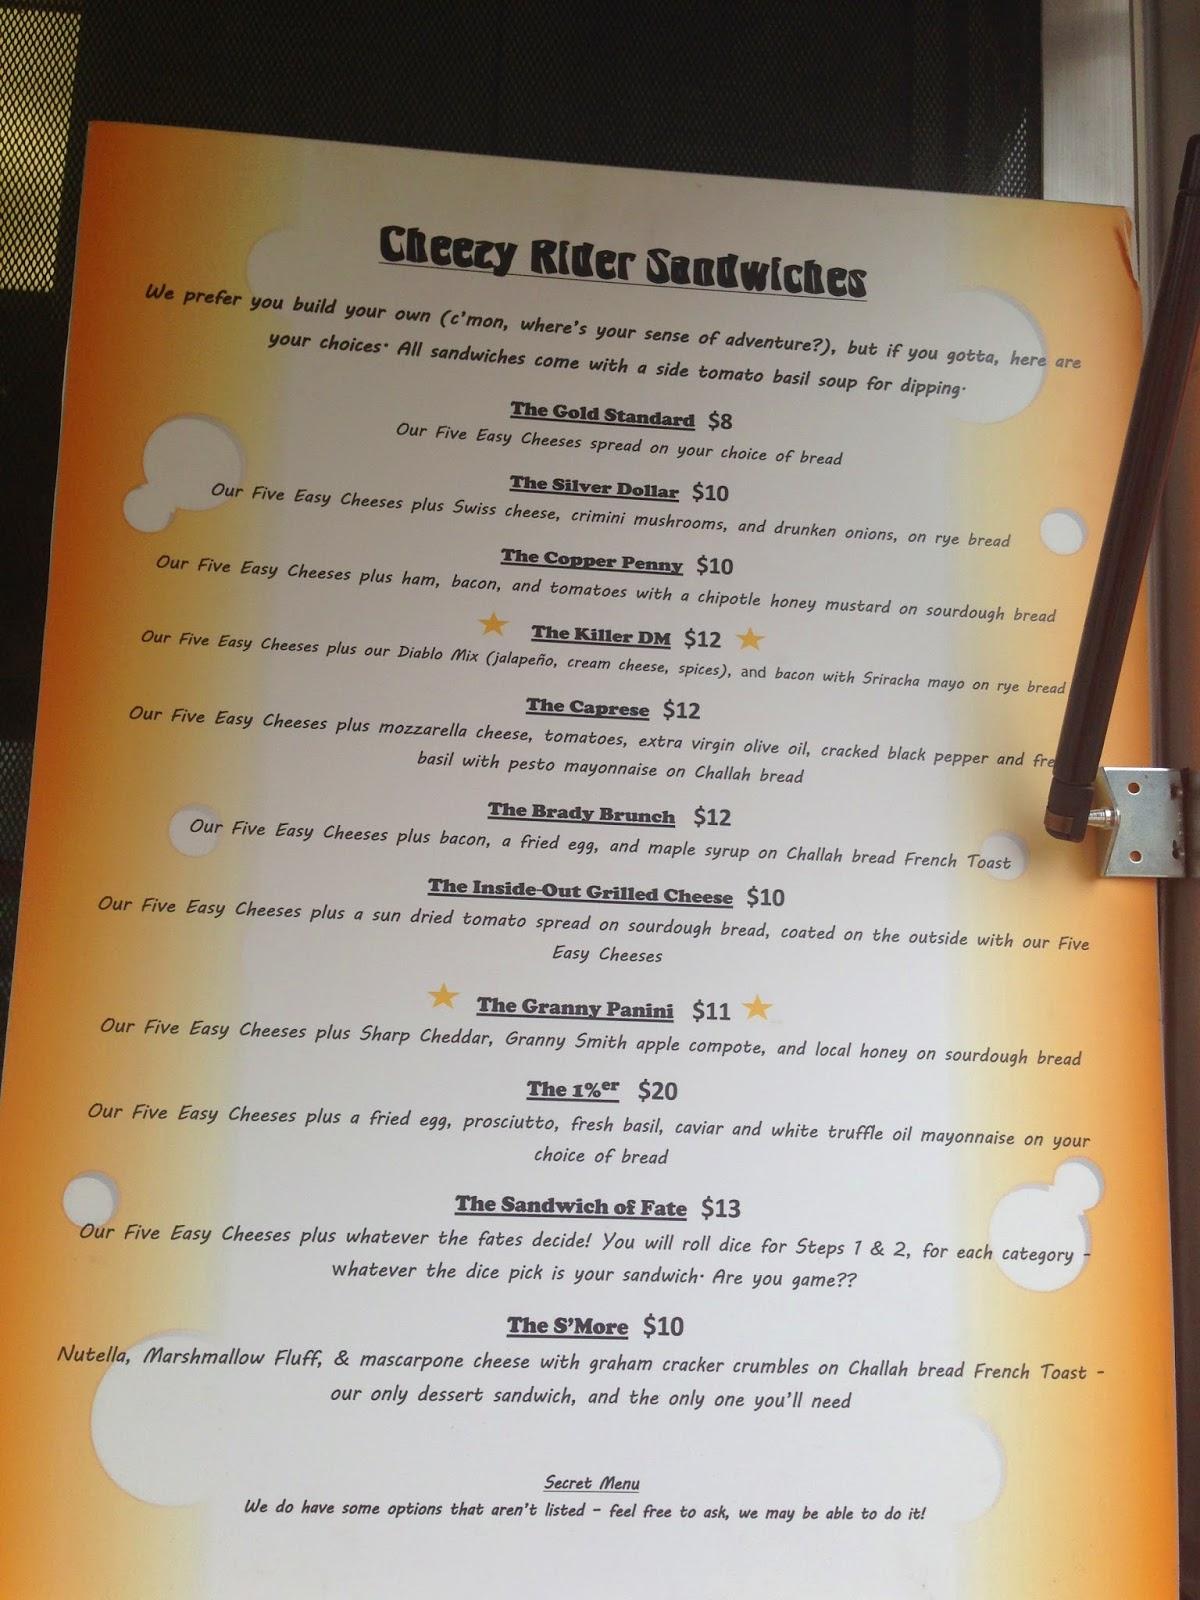 Cheezy Rider Food Truck Menu